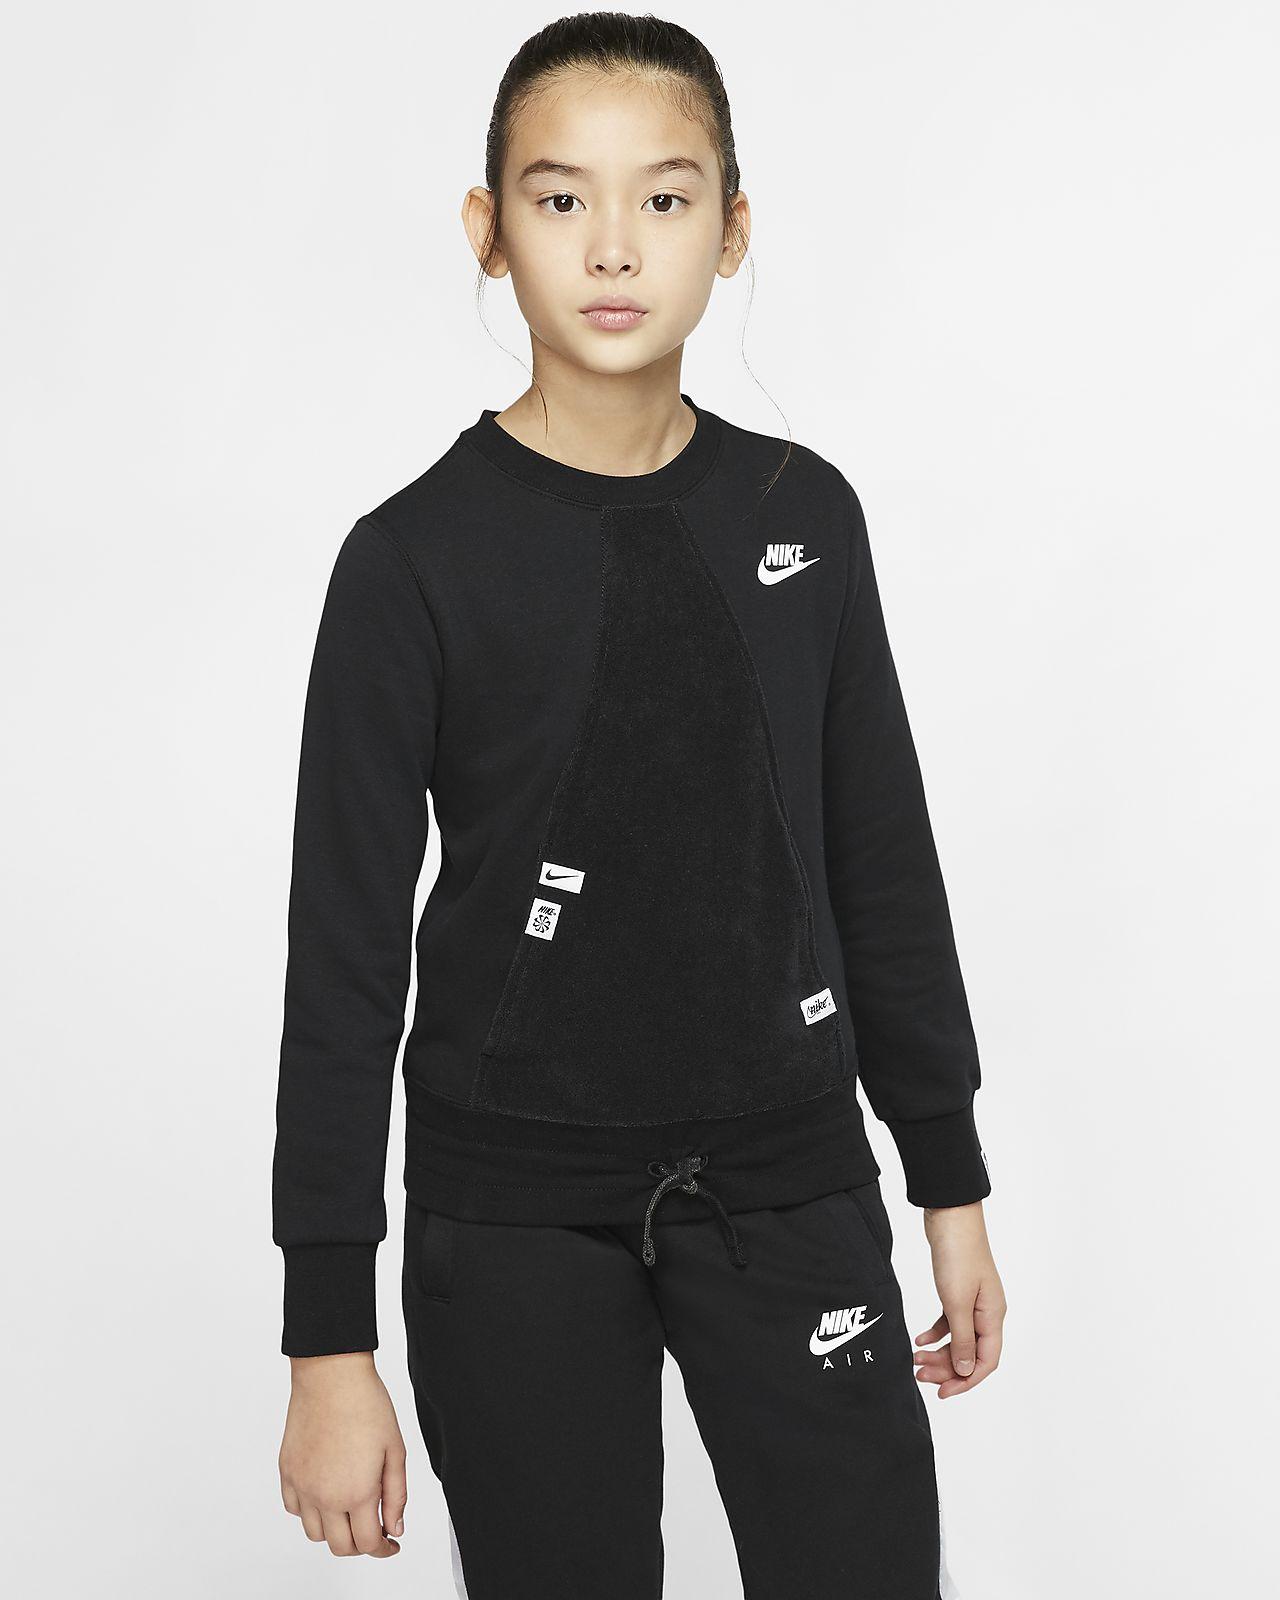 Nike Sportswear Heritage 大童(女孩)长袖上衣